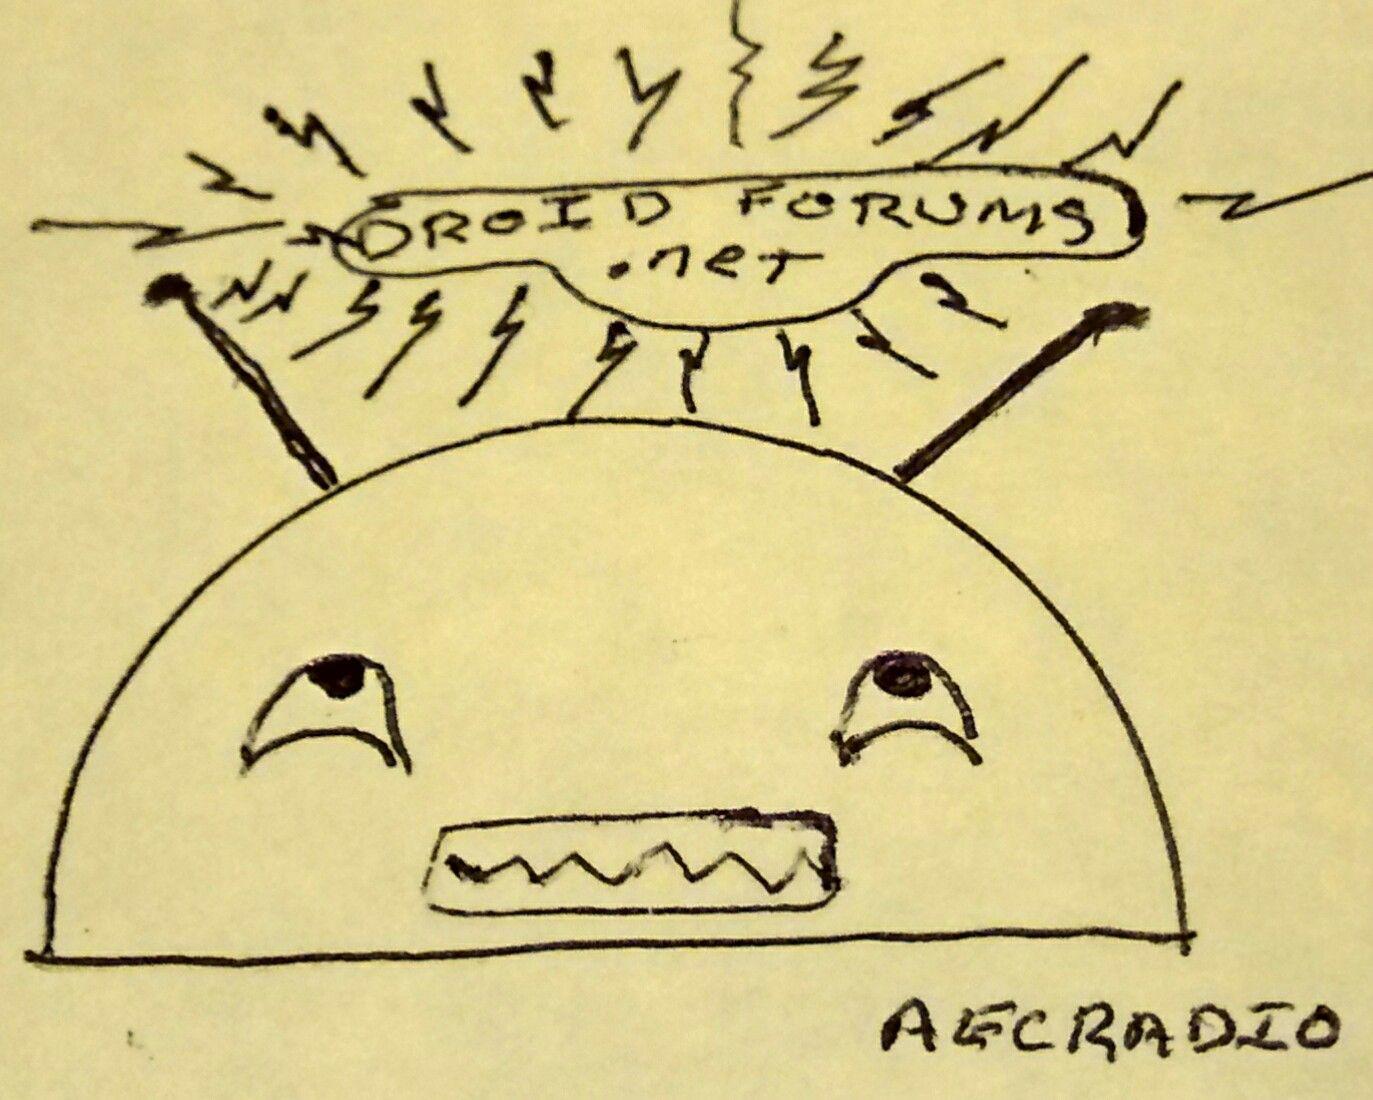 AECDROID2.jpg